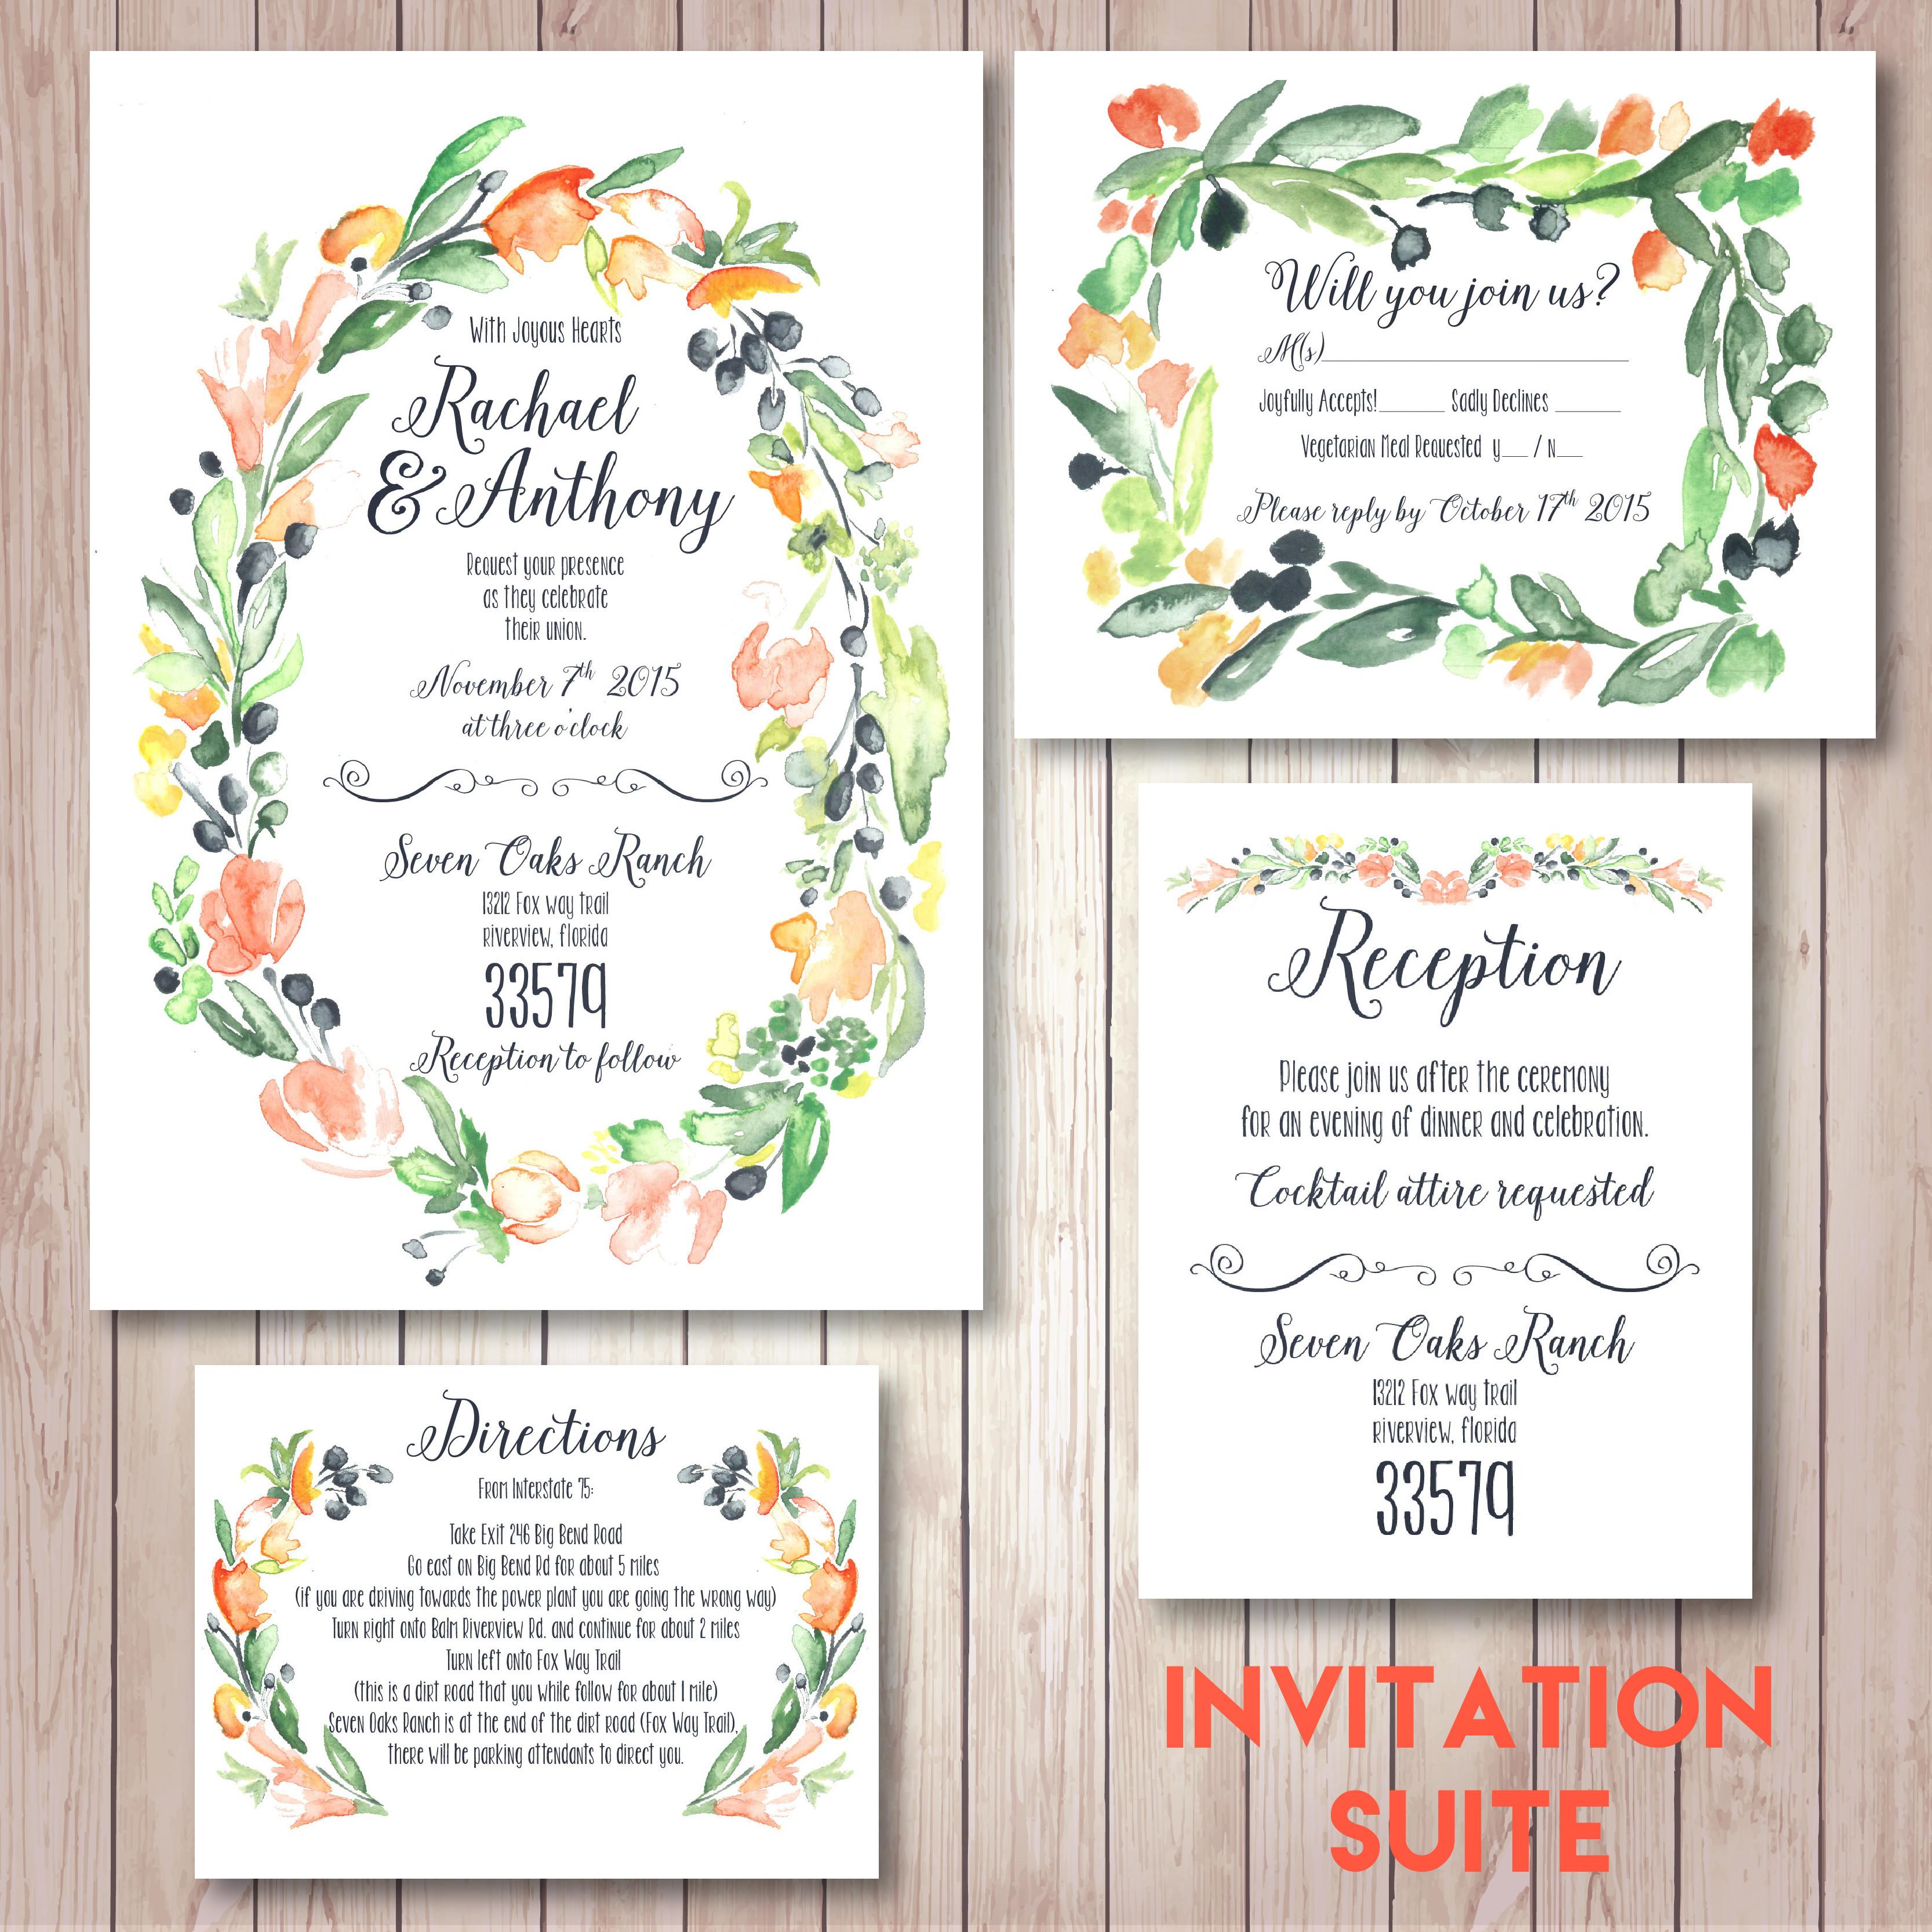 Invitation Suite | Stationary